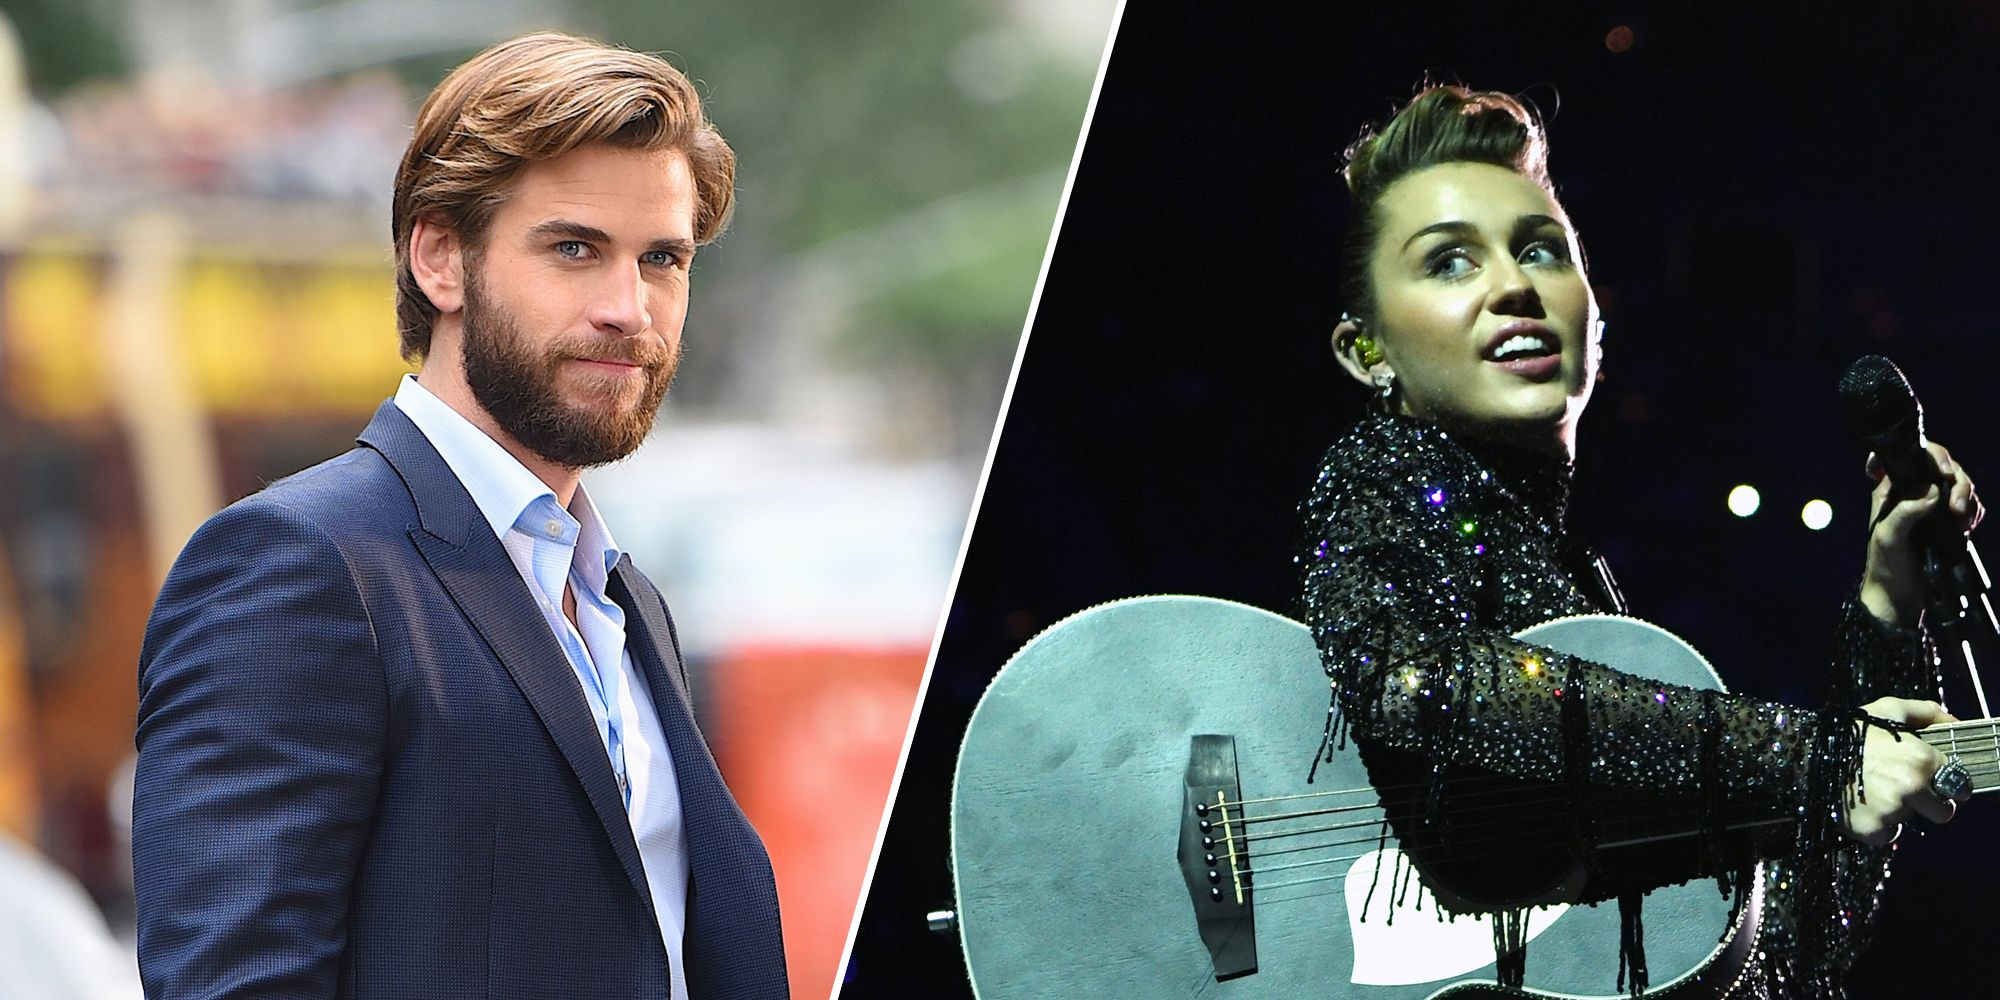 Liam Hemsworth Lyrics on Miley Cyrus's Younger Now Album - Liam